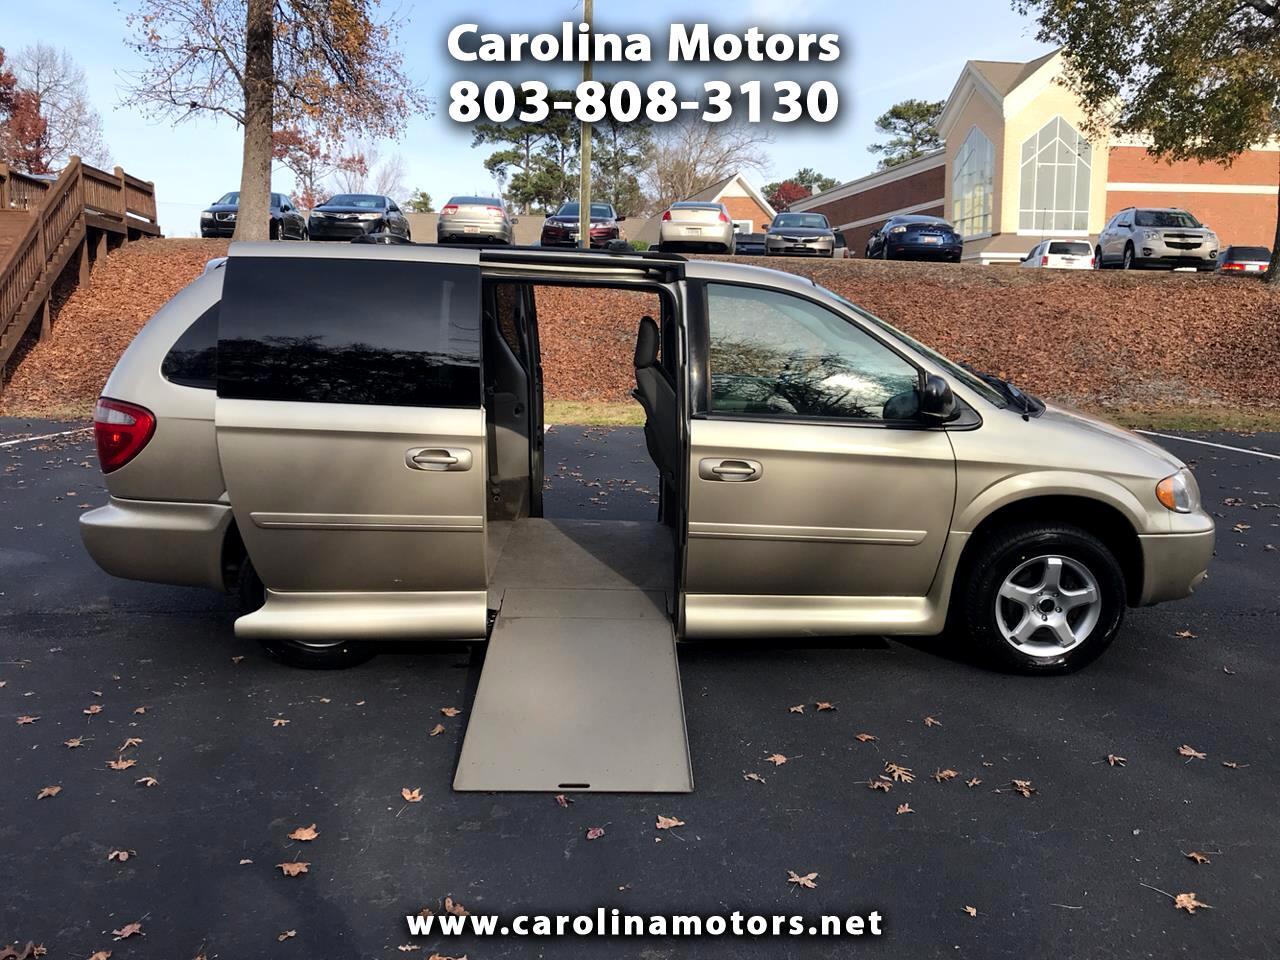 2006 Dodge Grand Caravan VMI North Star